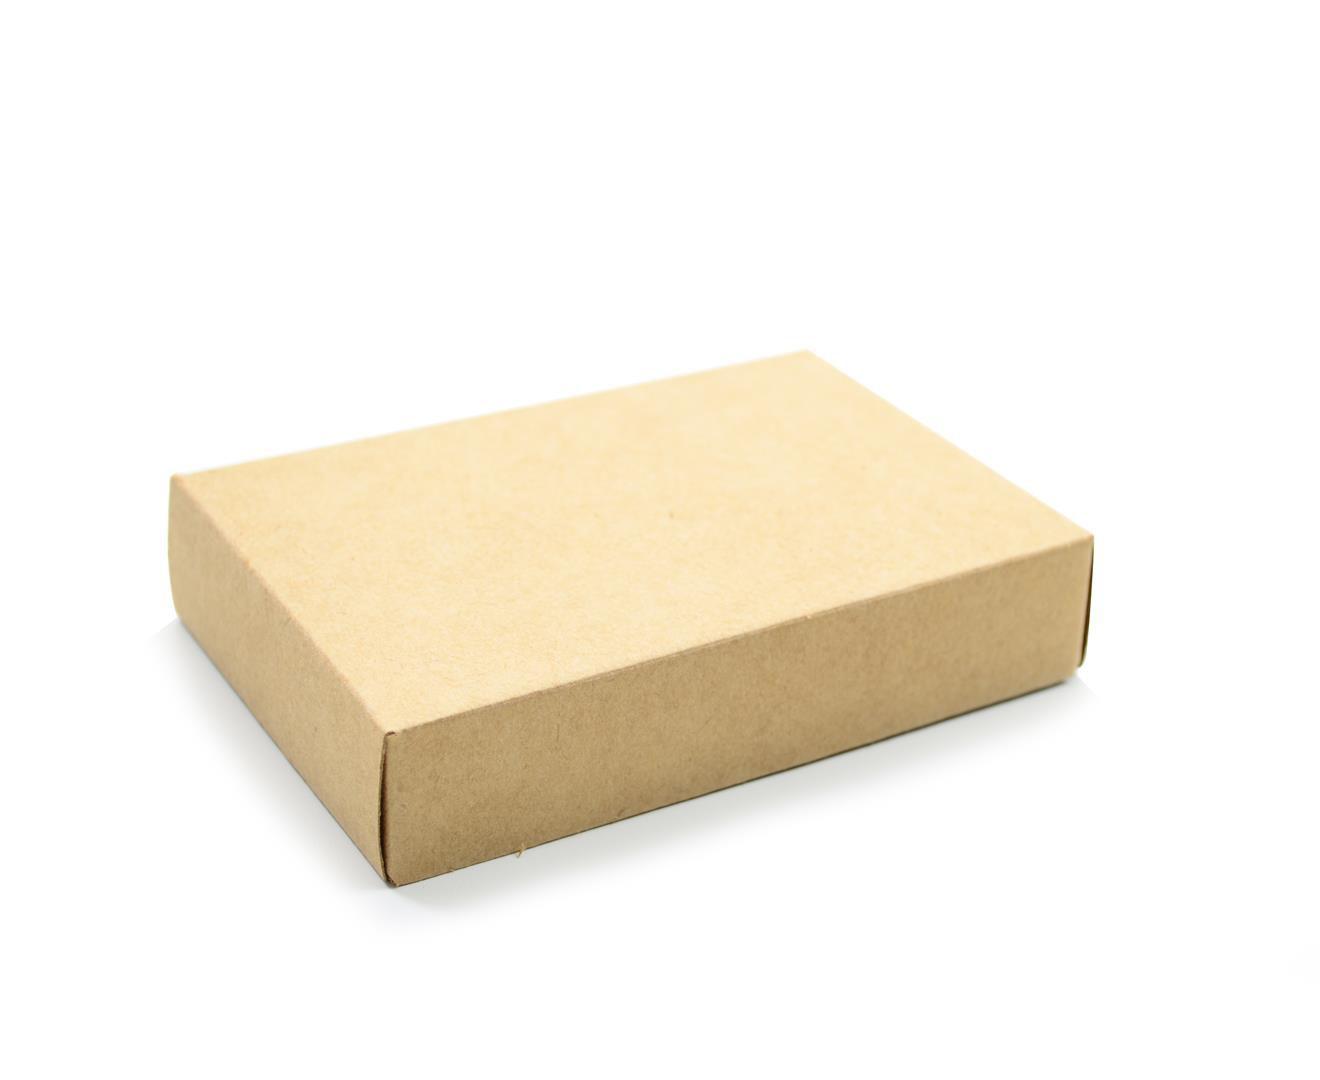 Ref 022 Kraft - Caixa c/ tampa papel - 14x9x3 cm - c/ 10 unidades